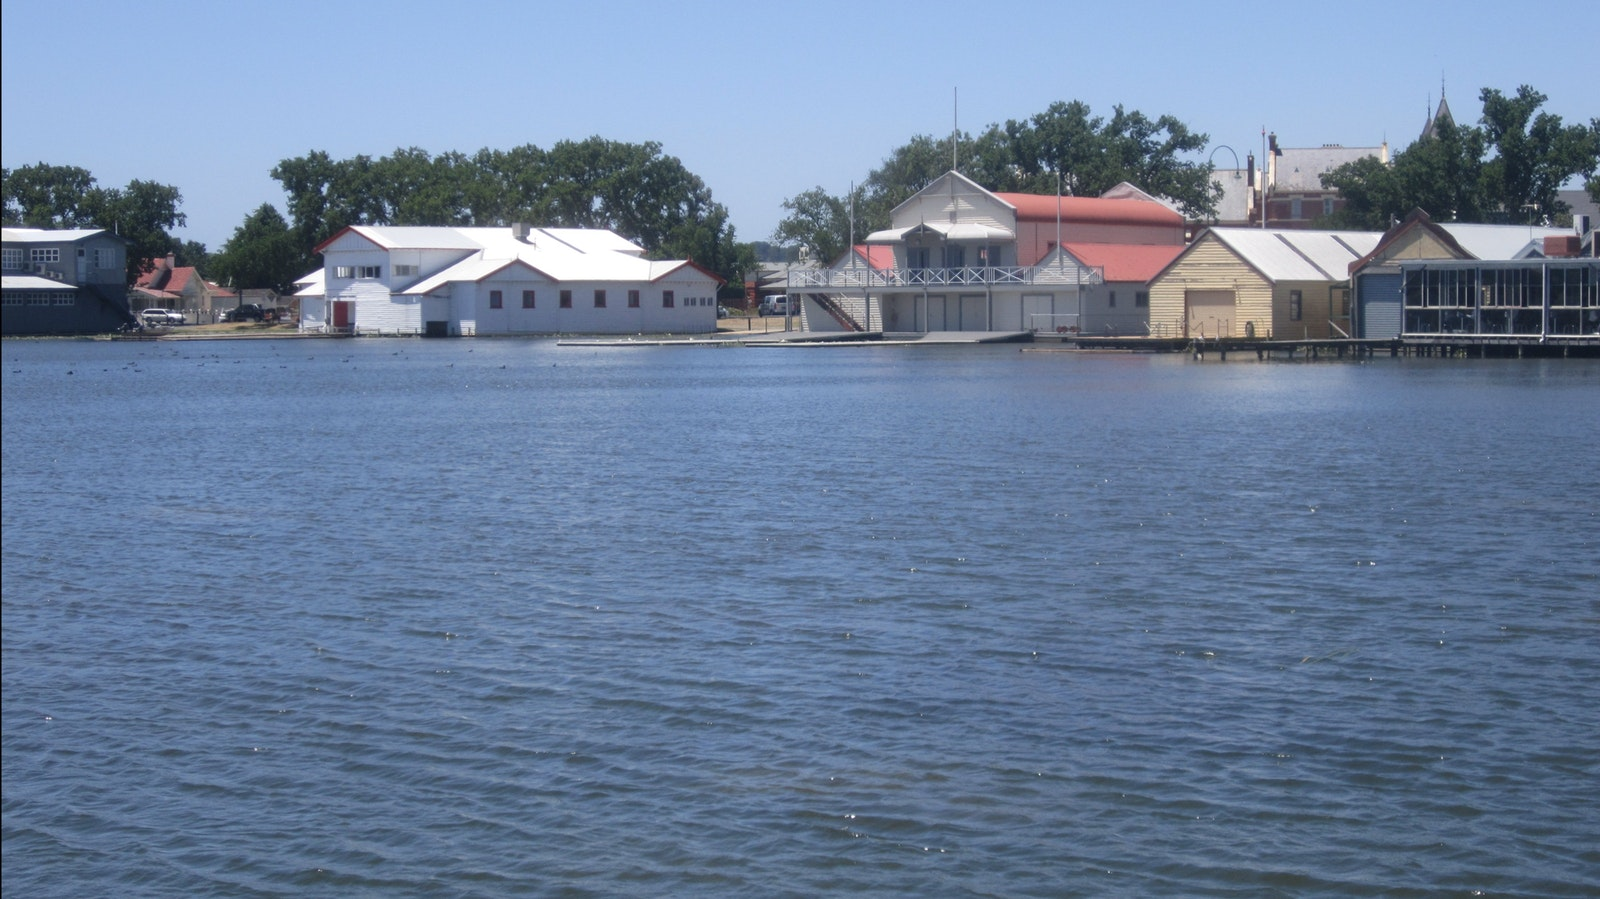 Rowing clubs Lake Wendouree, BALLARAT - Goldfields